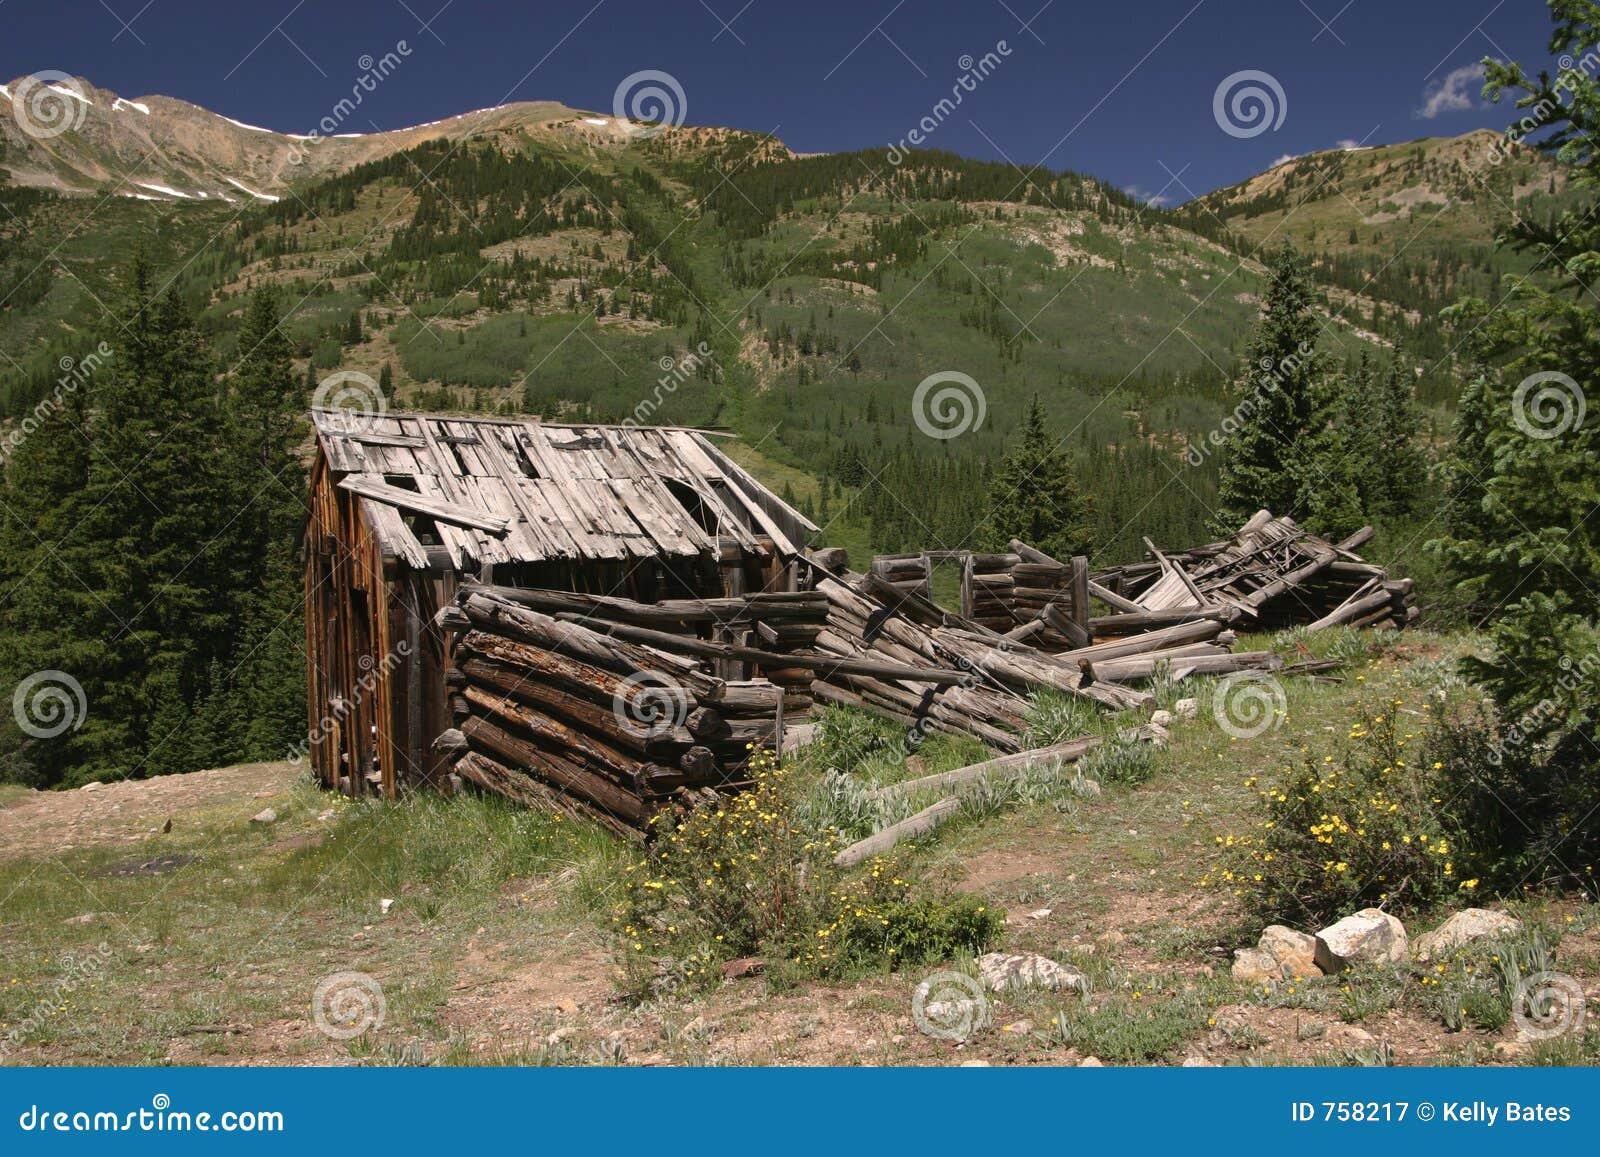 c14-banker-mine-bunkhouse-758217 Cowboy Bunkhouse Plans on cowboy cabin plans, cowboy campfire, floor plans, cowboy outdoor kitchen, cowboy fabric, cowboy house plans, cowboy kitchen plans, cowboy cooler plans, cowboy accessories for the home, tiny house trailer plans, cowboy porch, small house plans,